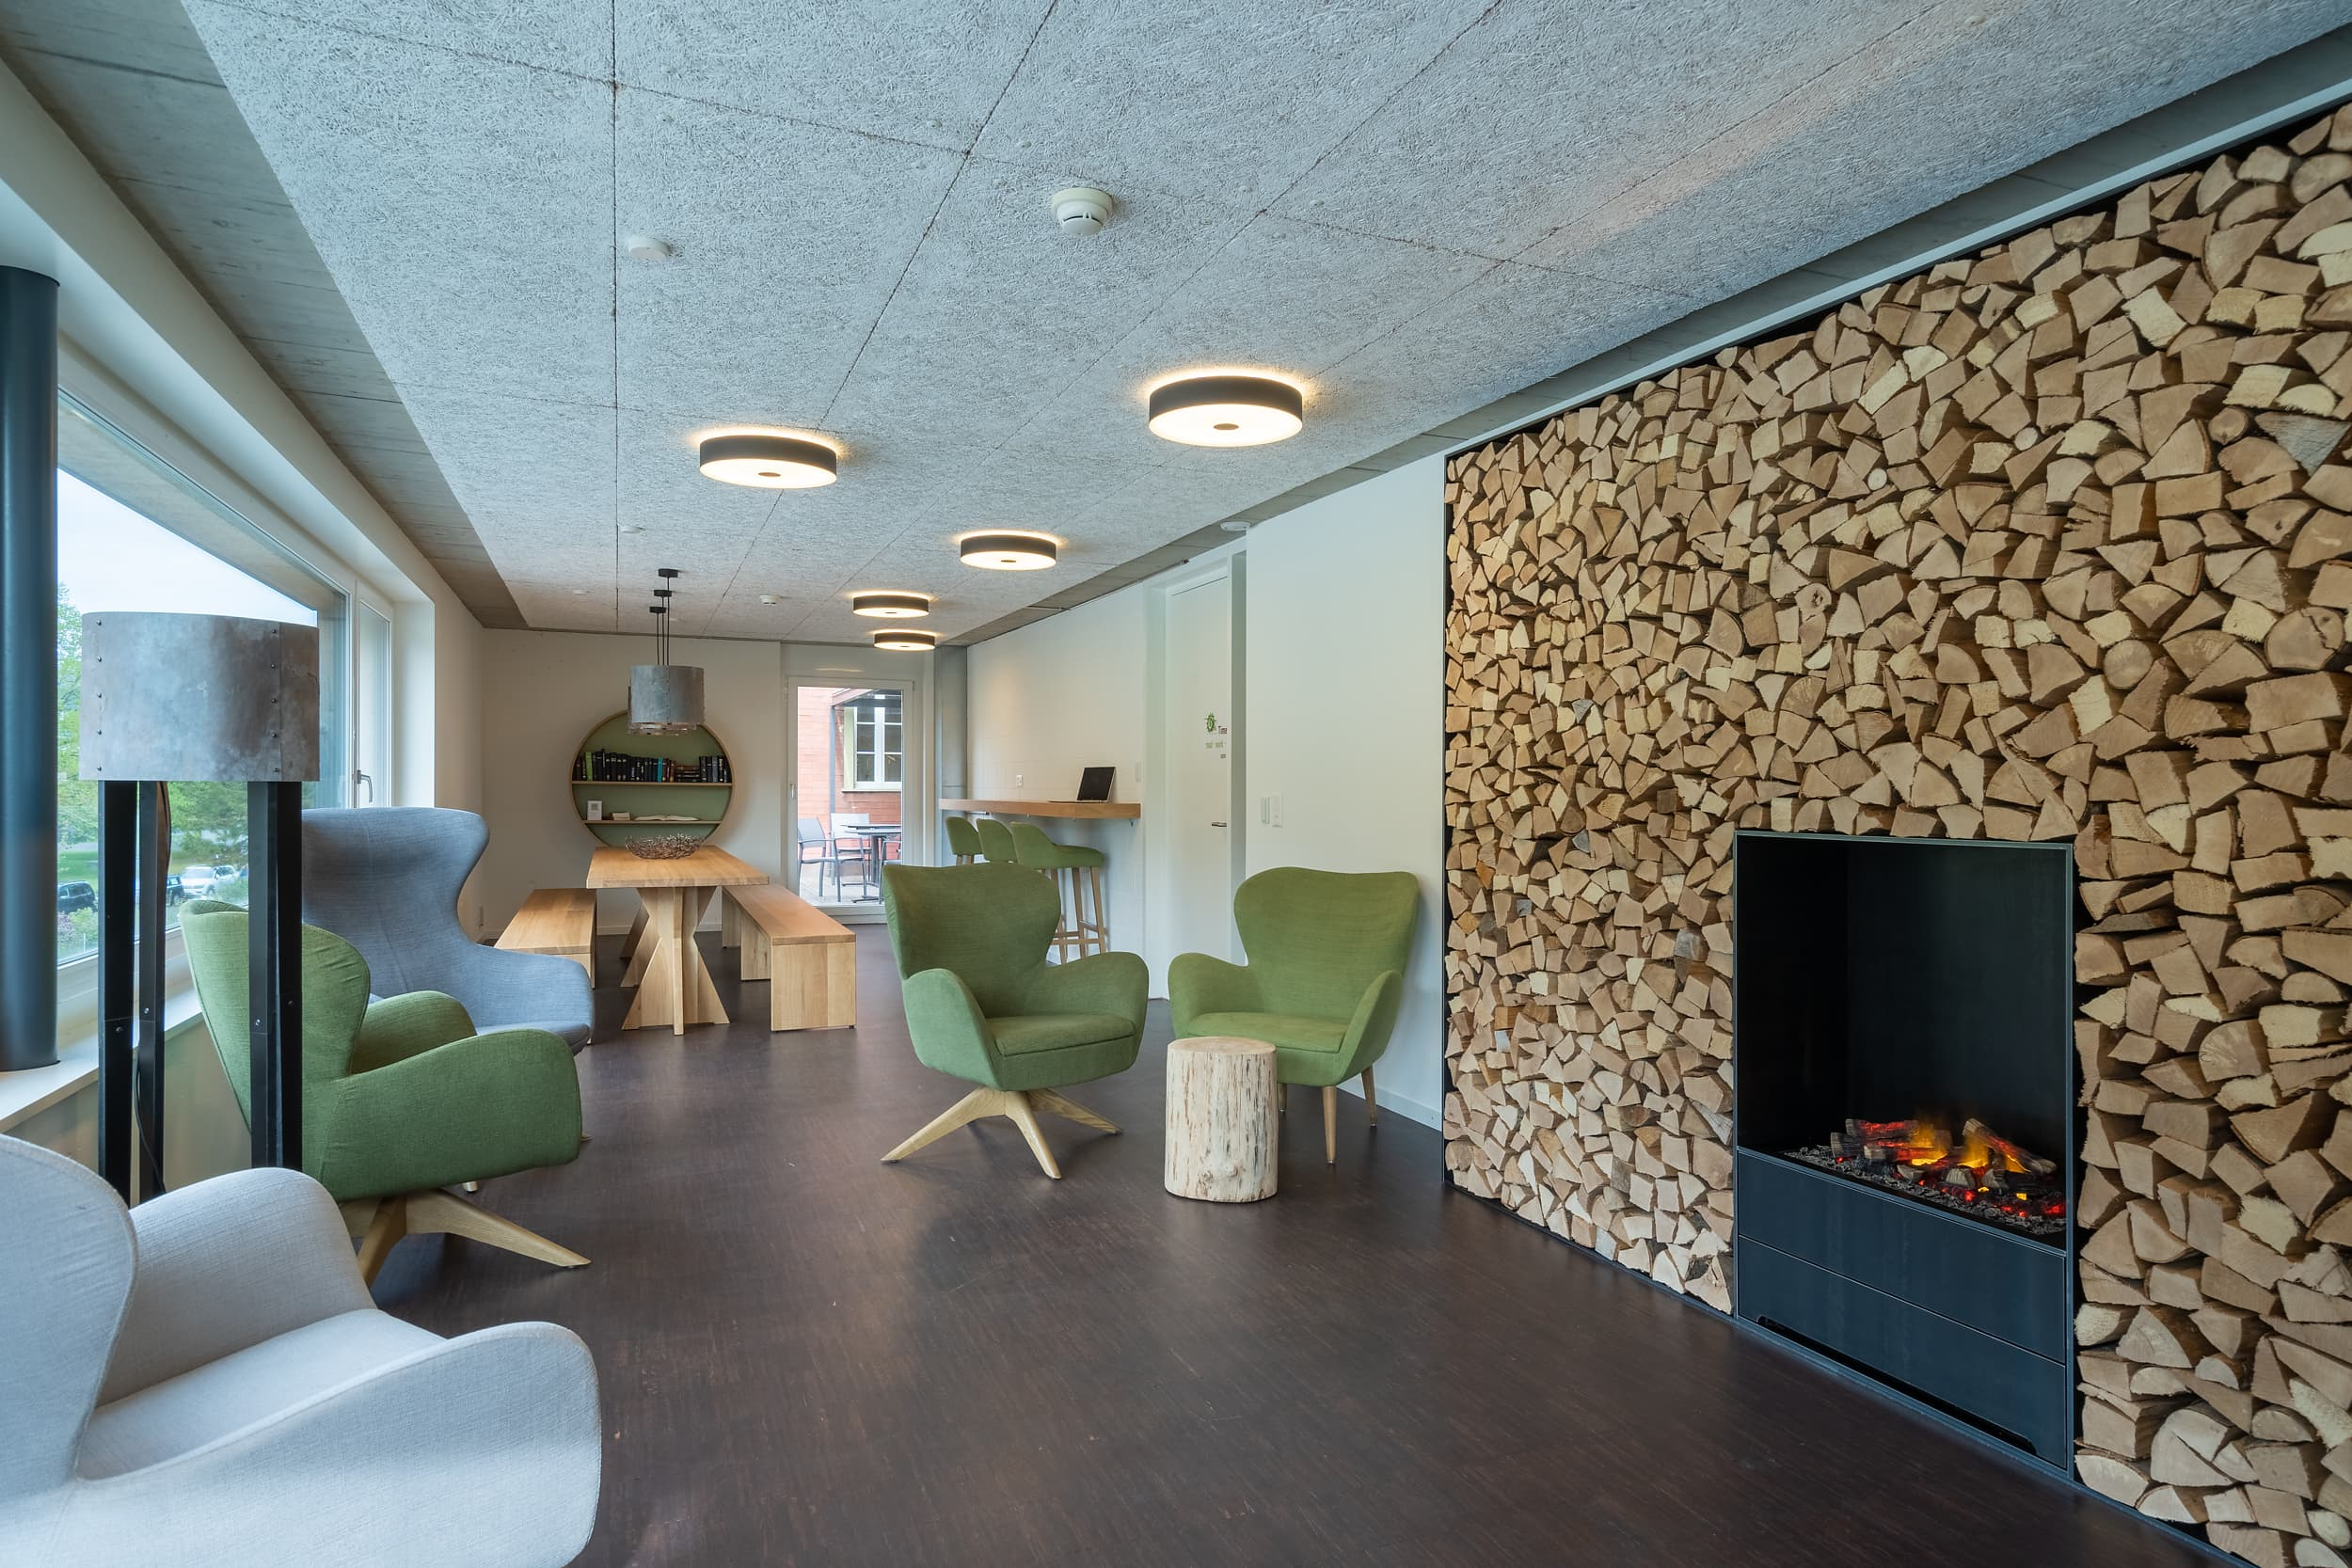 Coworking-Space In Der Backpackers Villa Sonnenhof In